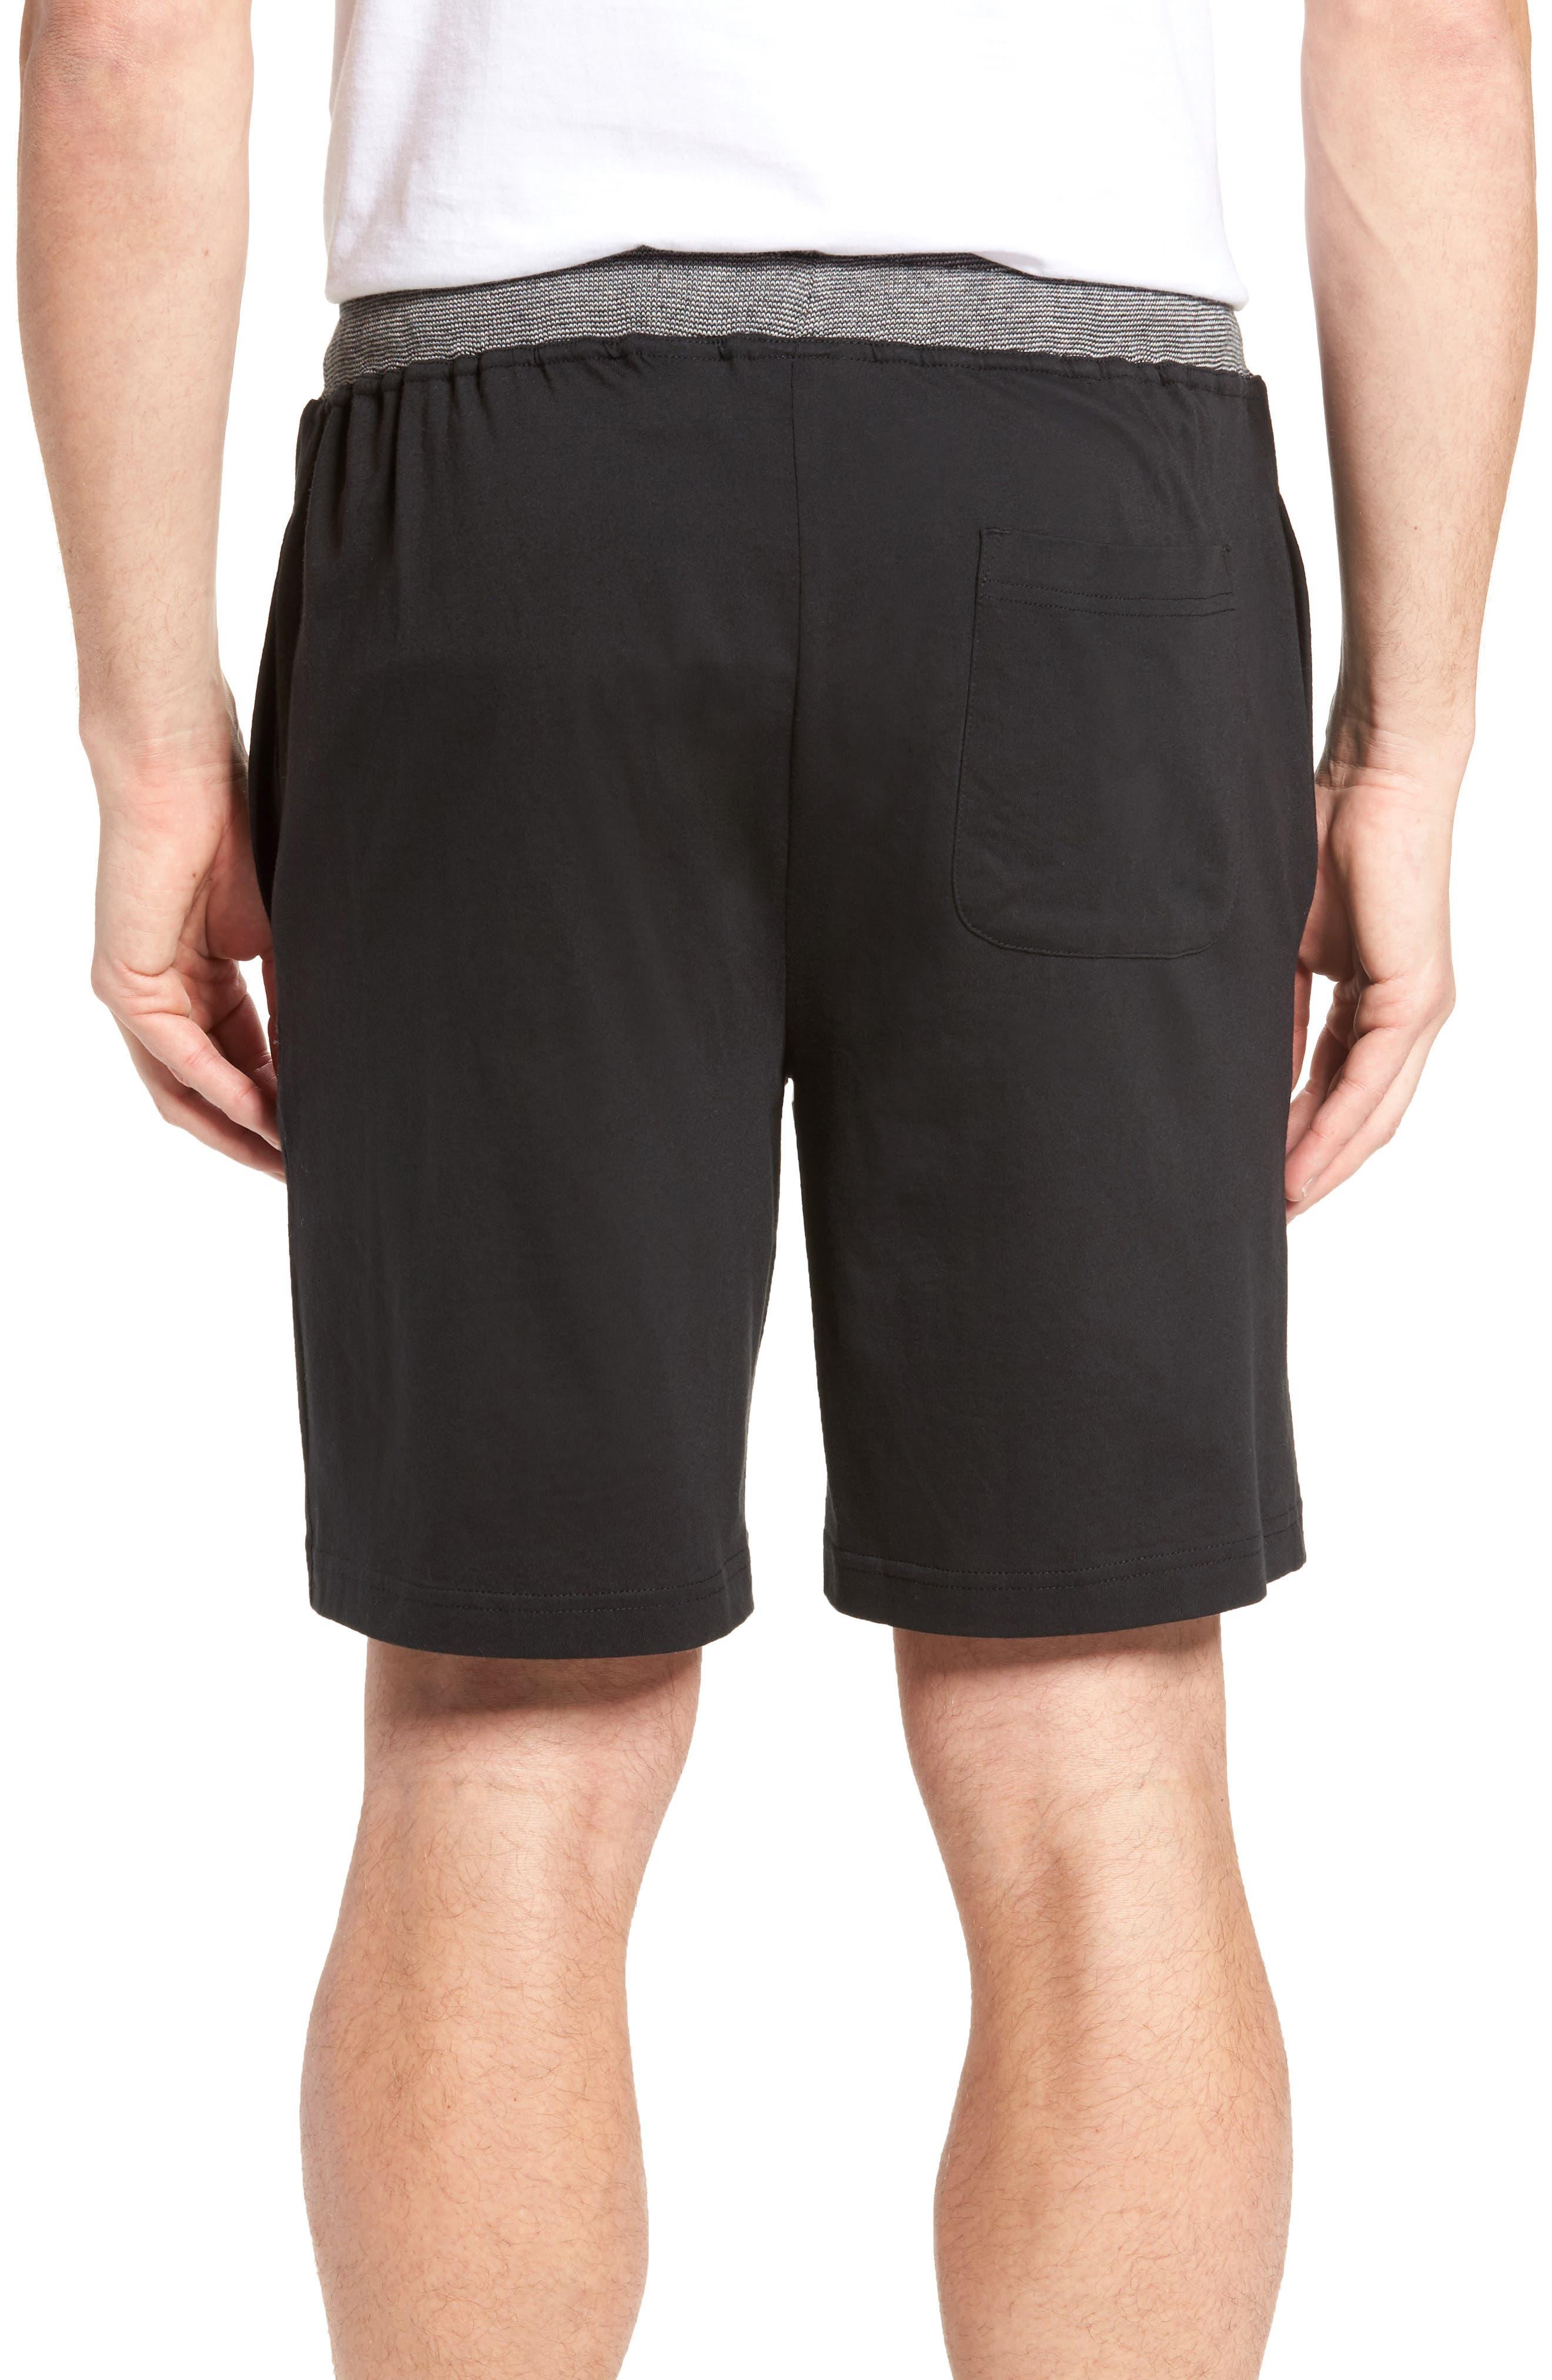 Cotton Lounge Shorts,                             Alternate thumbnail 2, color,                             Solid Black